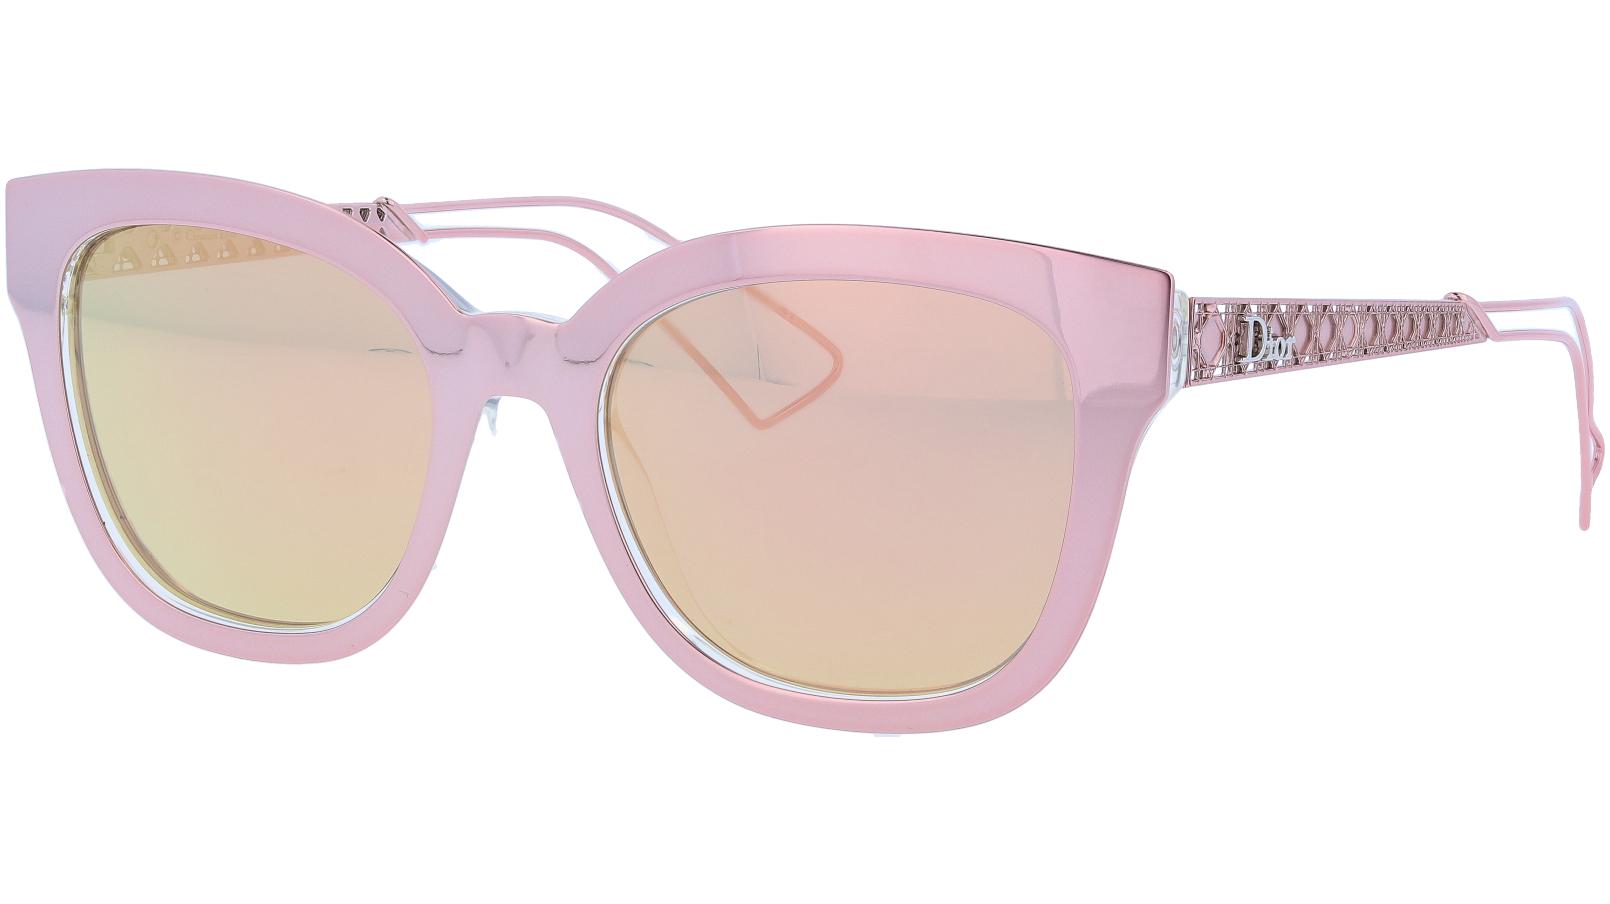 Dior AMA1 2IF0J 52 MTBURG Sunglasses